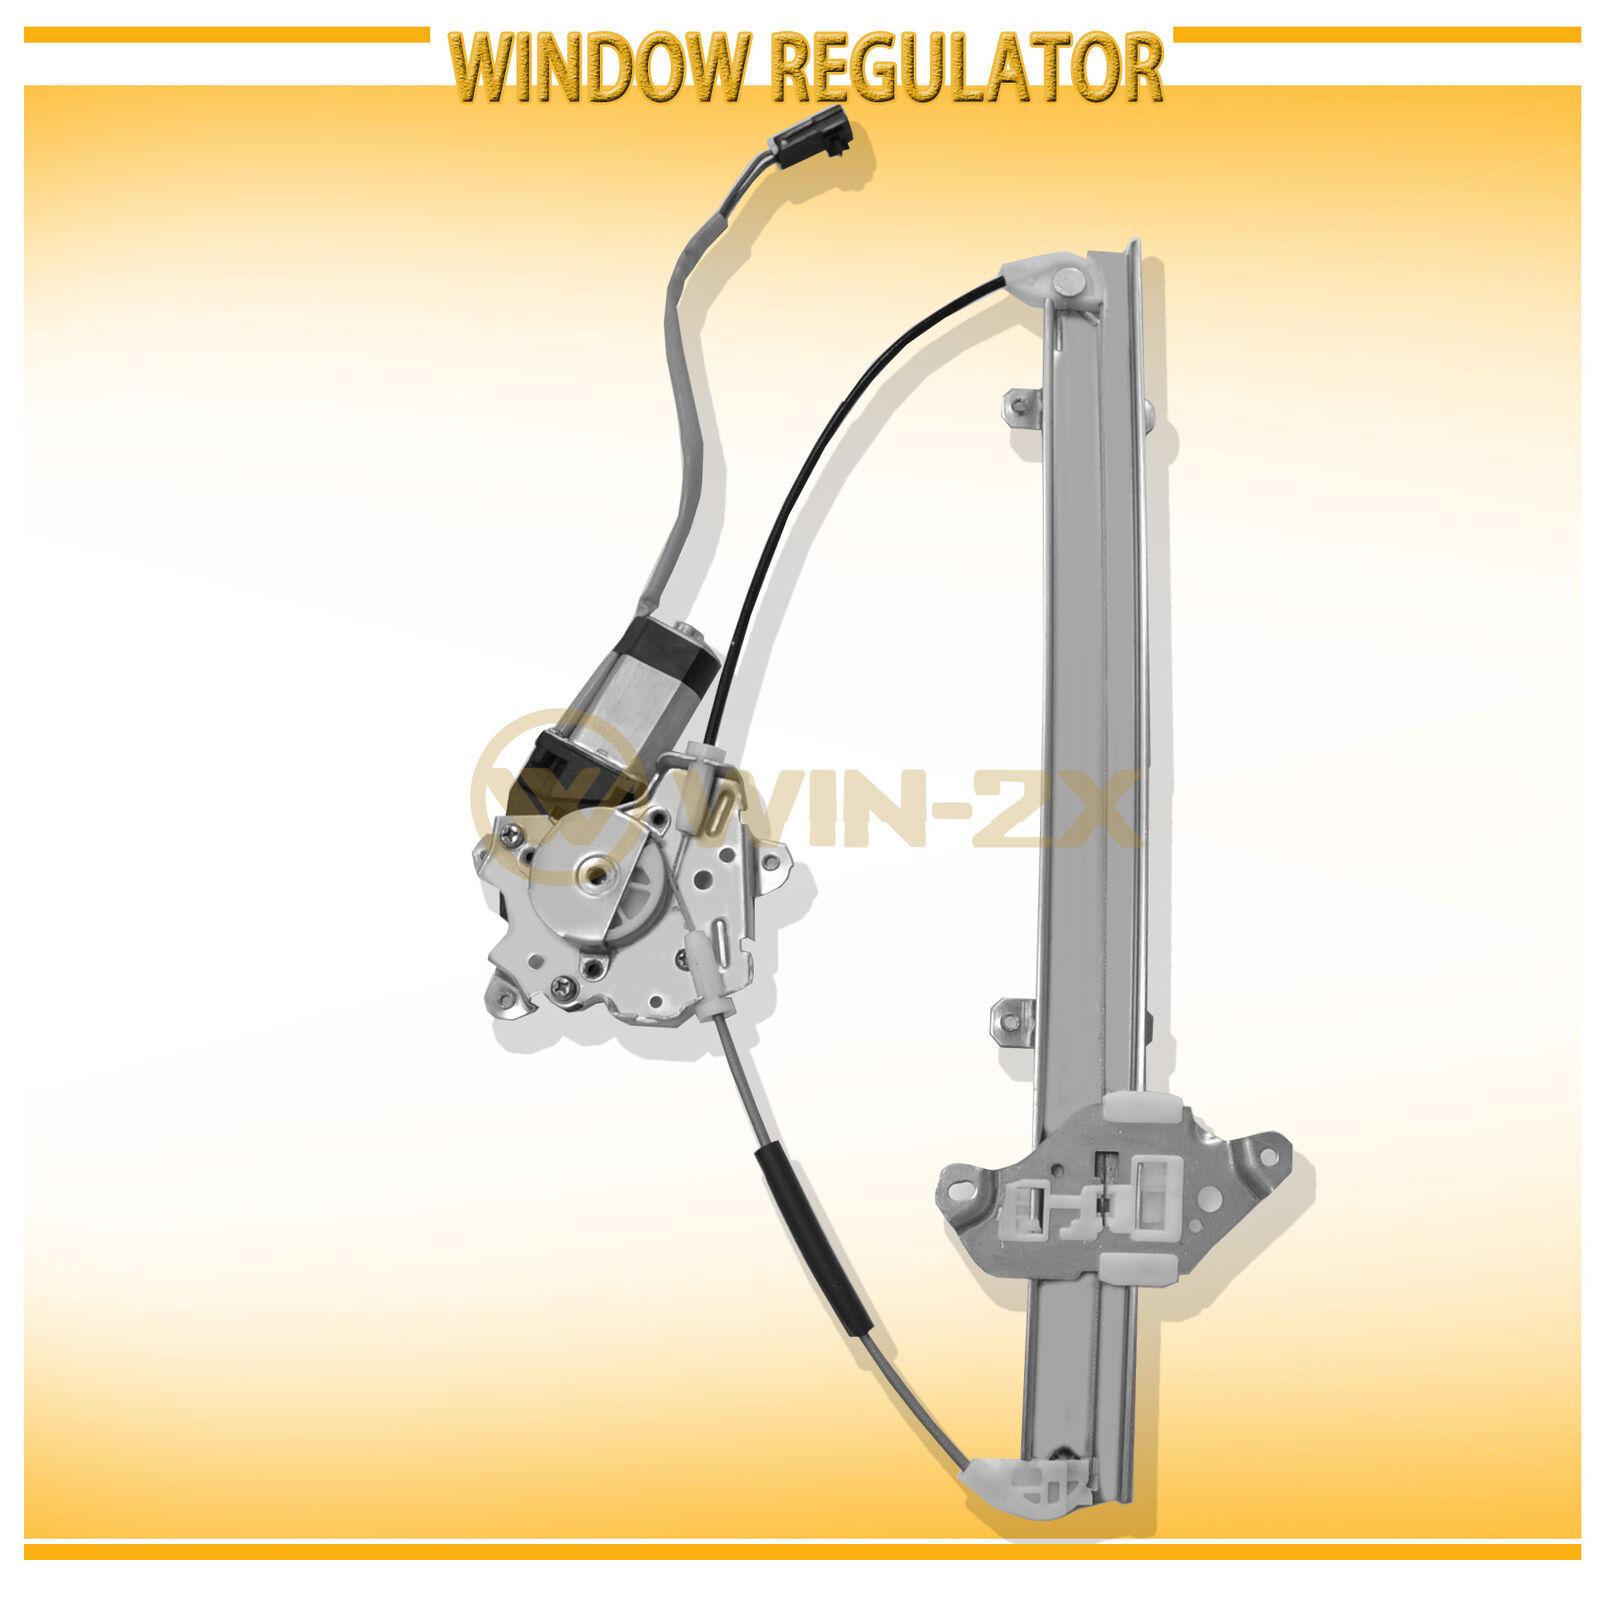 New Window Regulator Front Left with Motor fits 2000-2006 Nissan Sentra